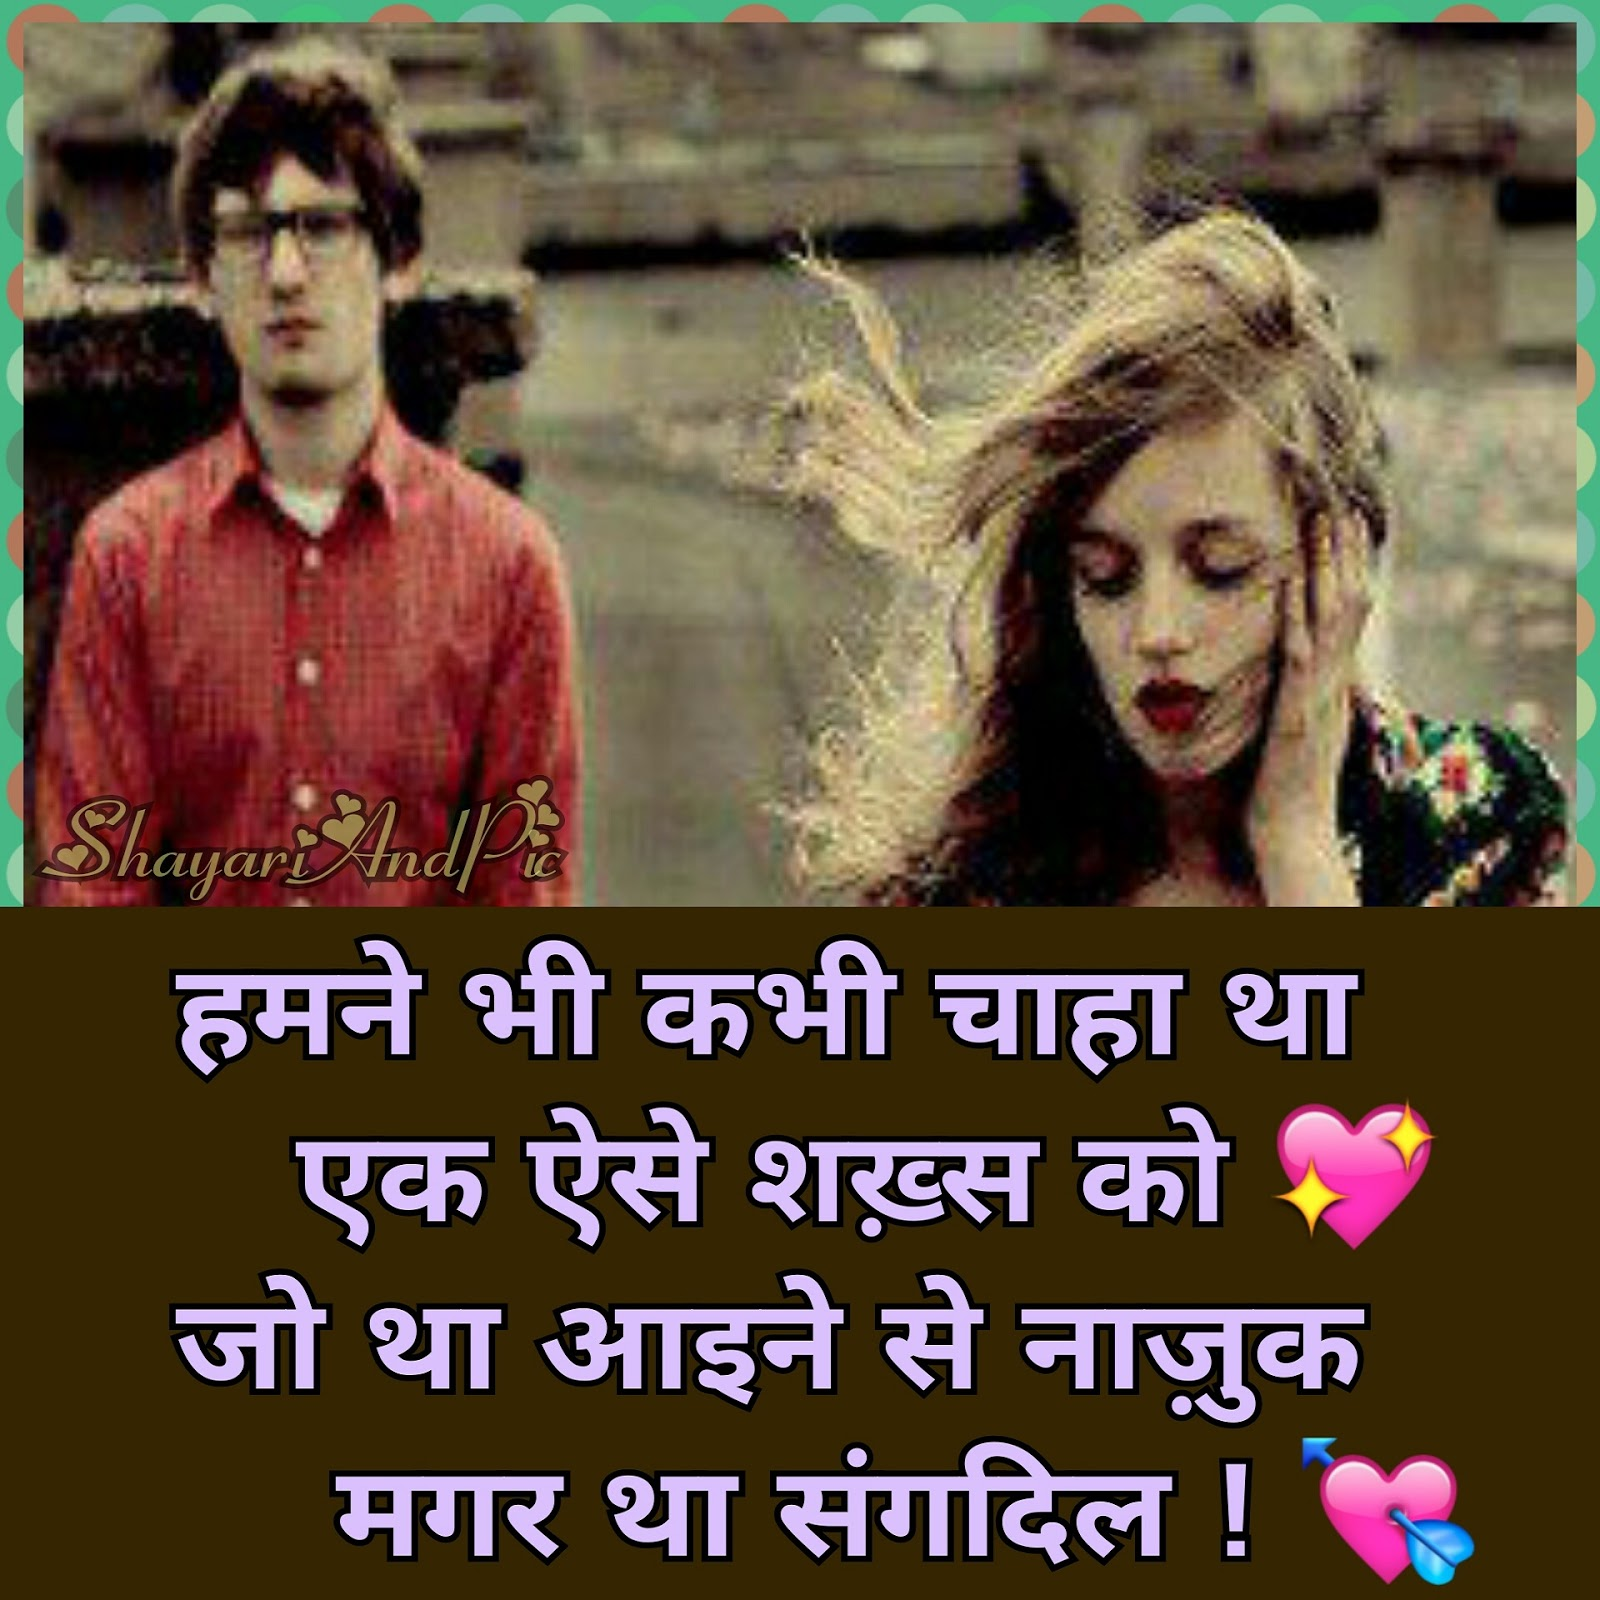 Whatsapp hindi shayari image download